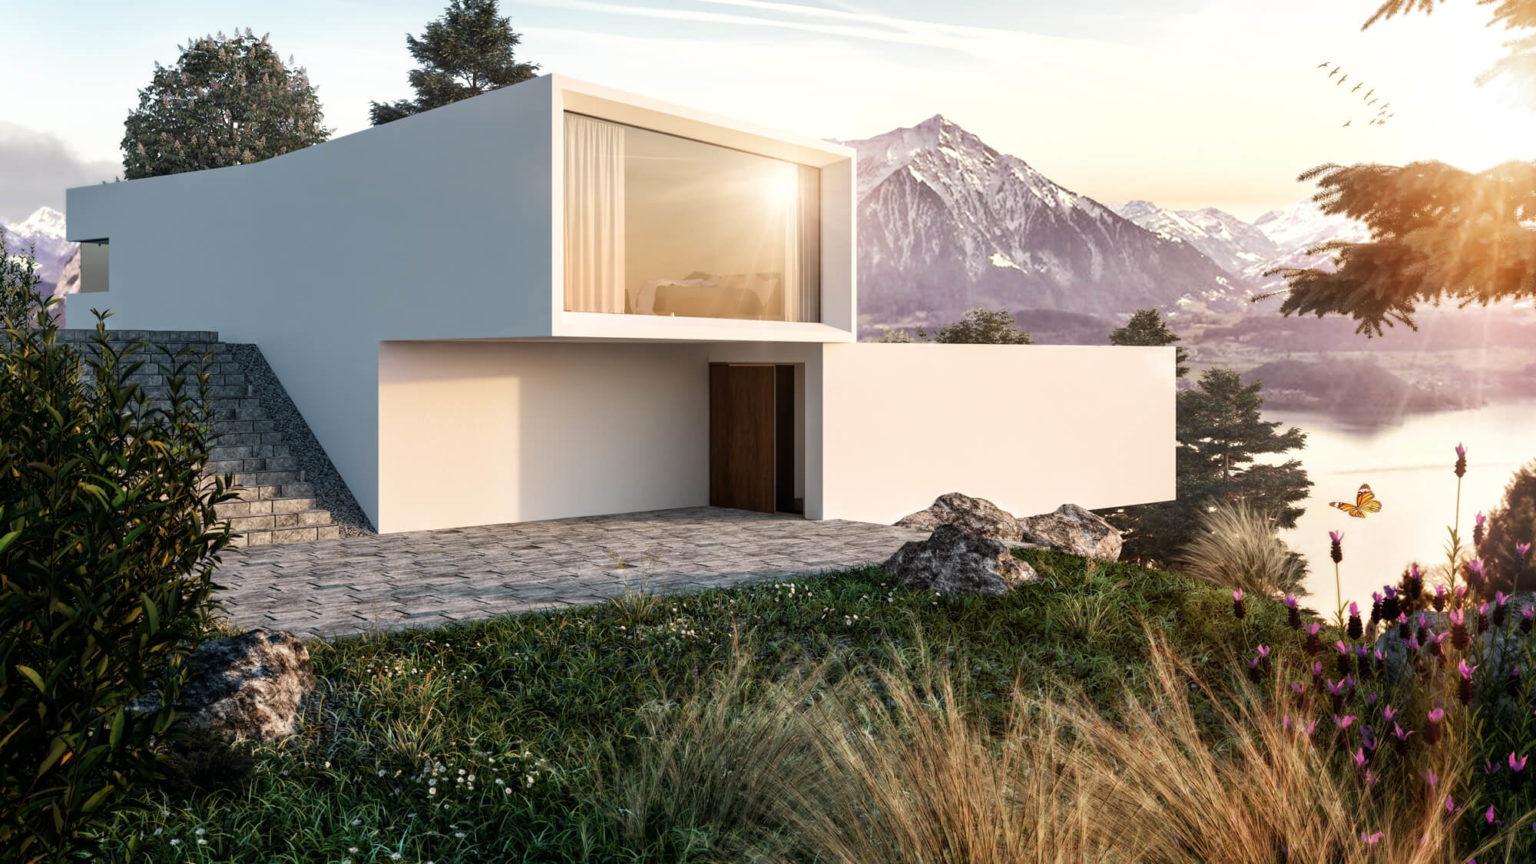 Hector Alamar architects